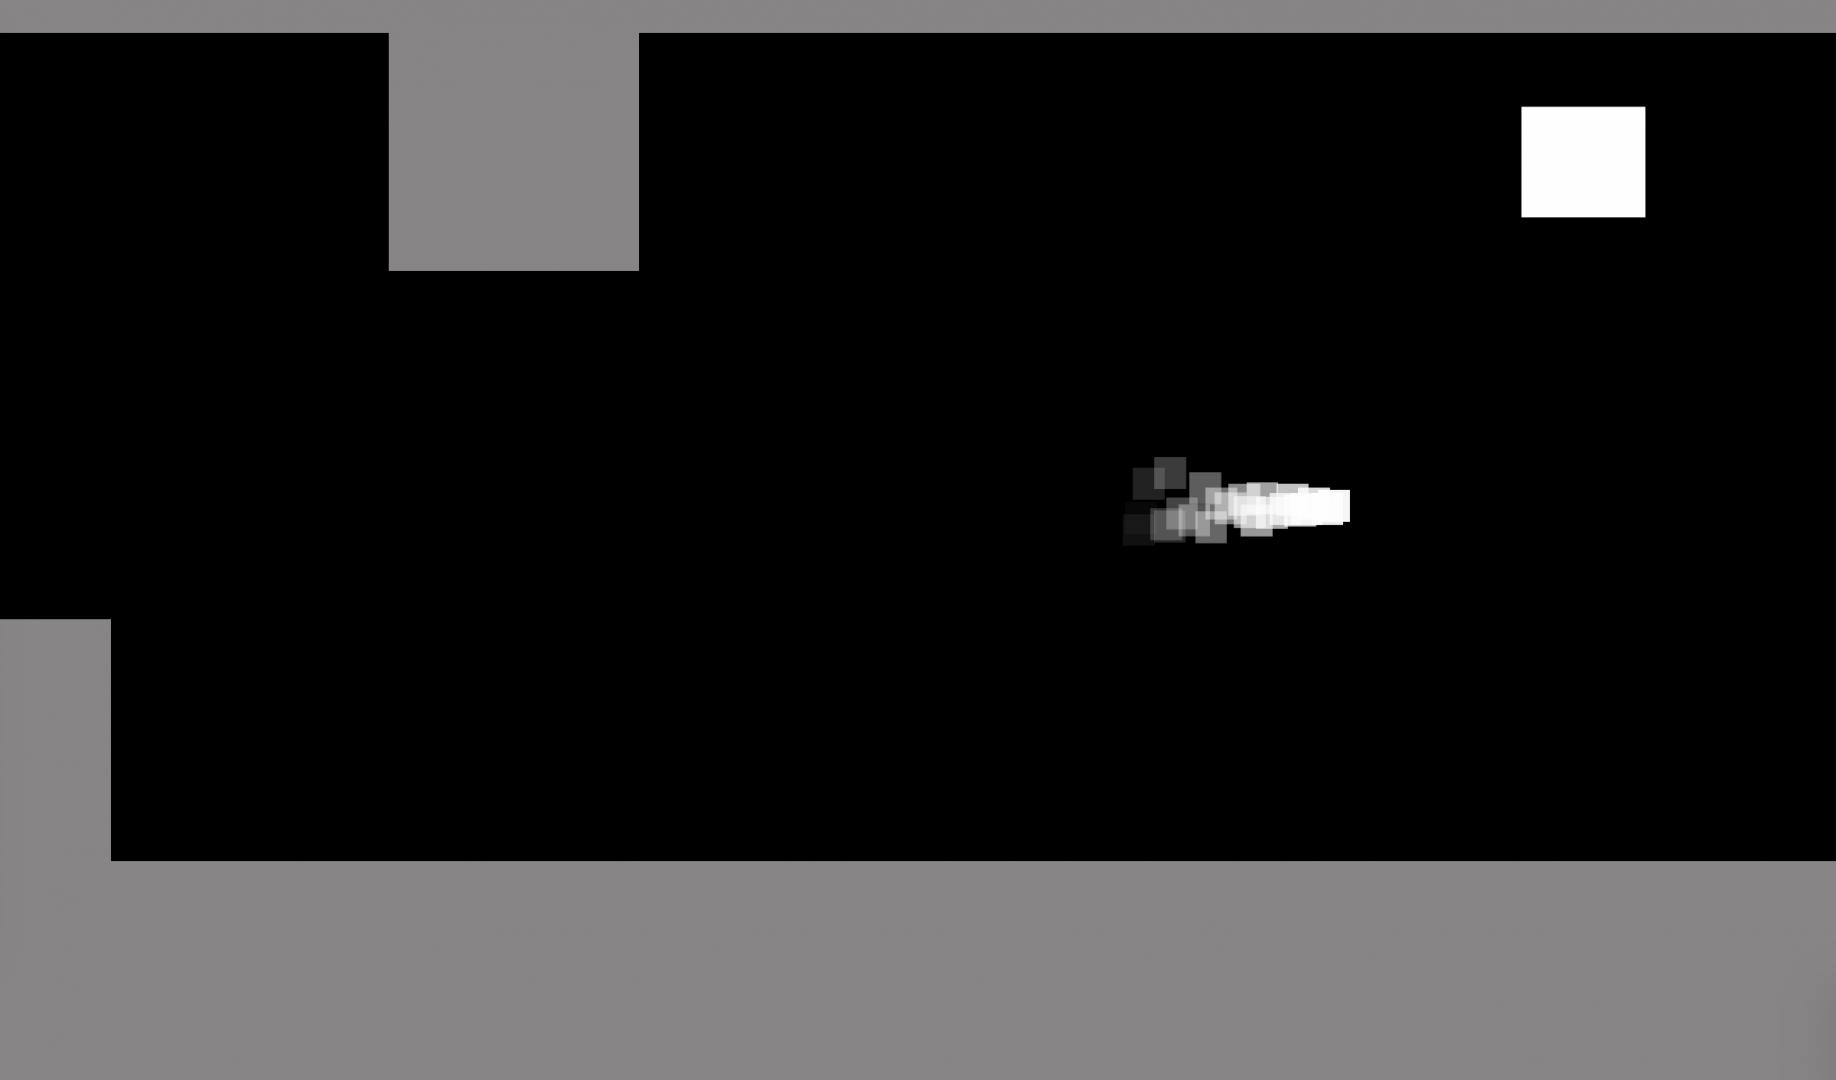 Screenshot 2 of Endless Runner playable.